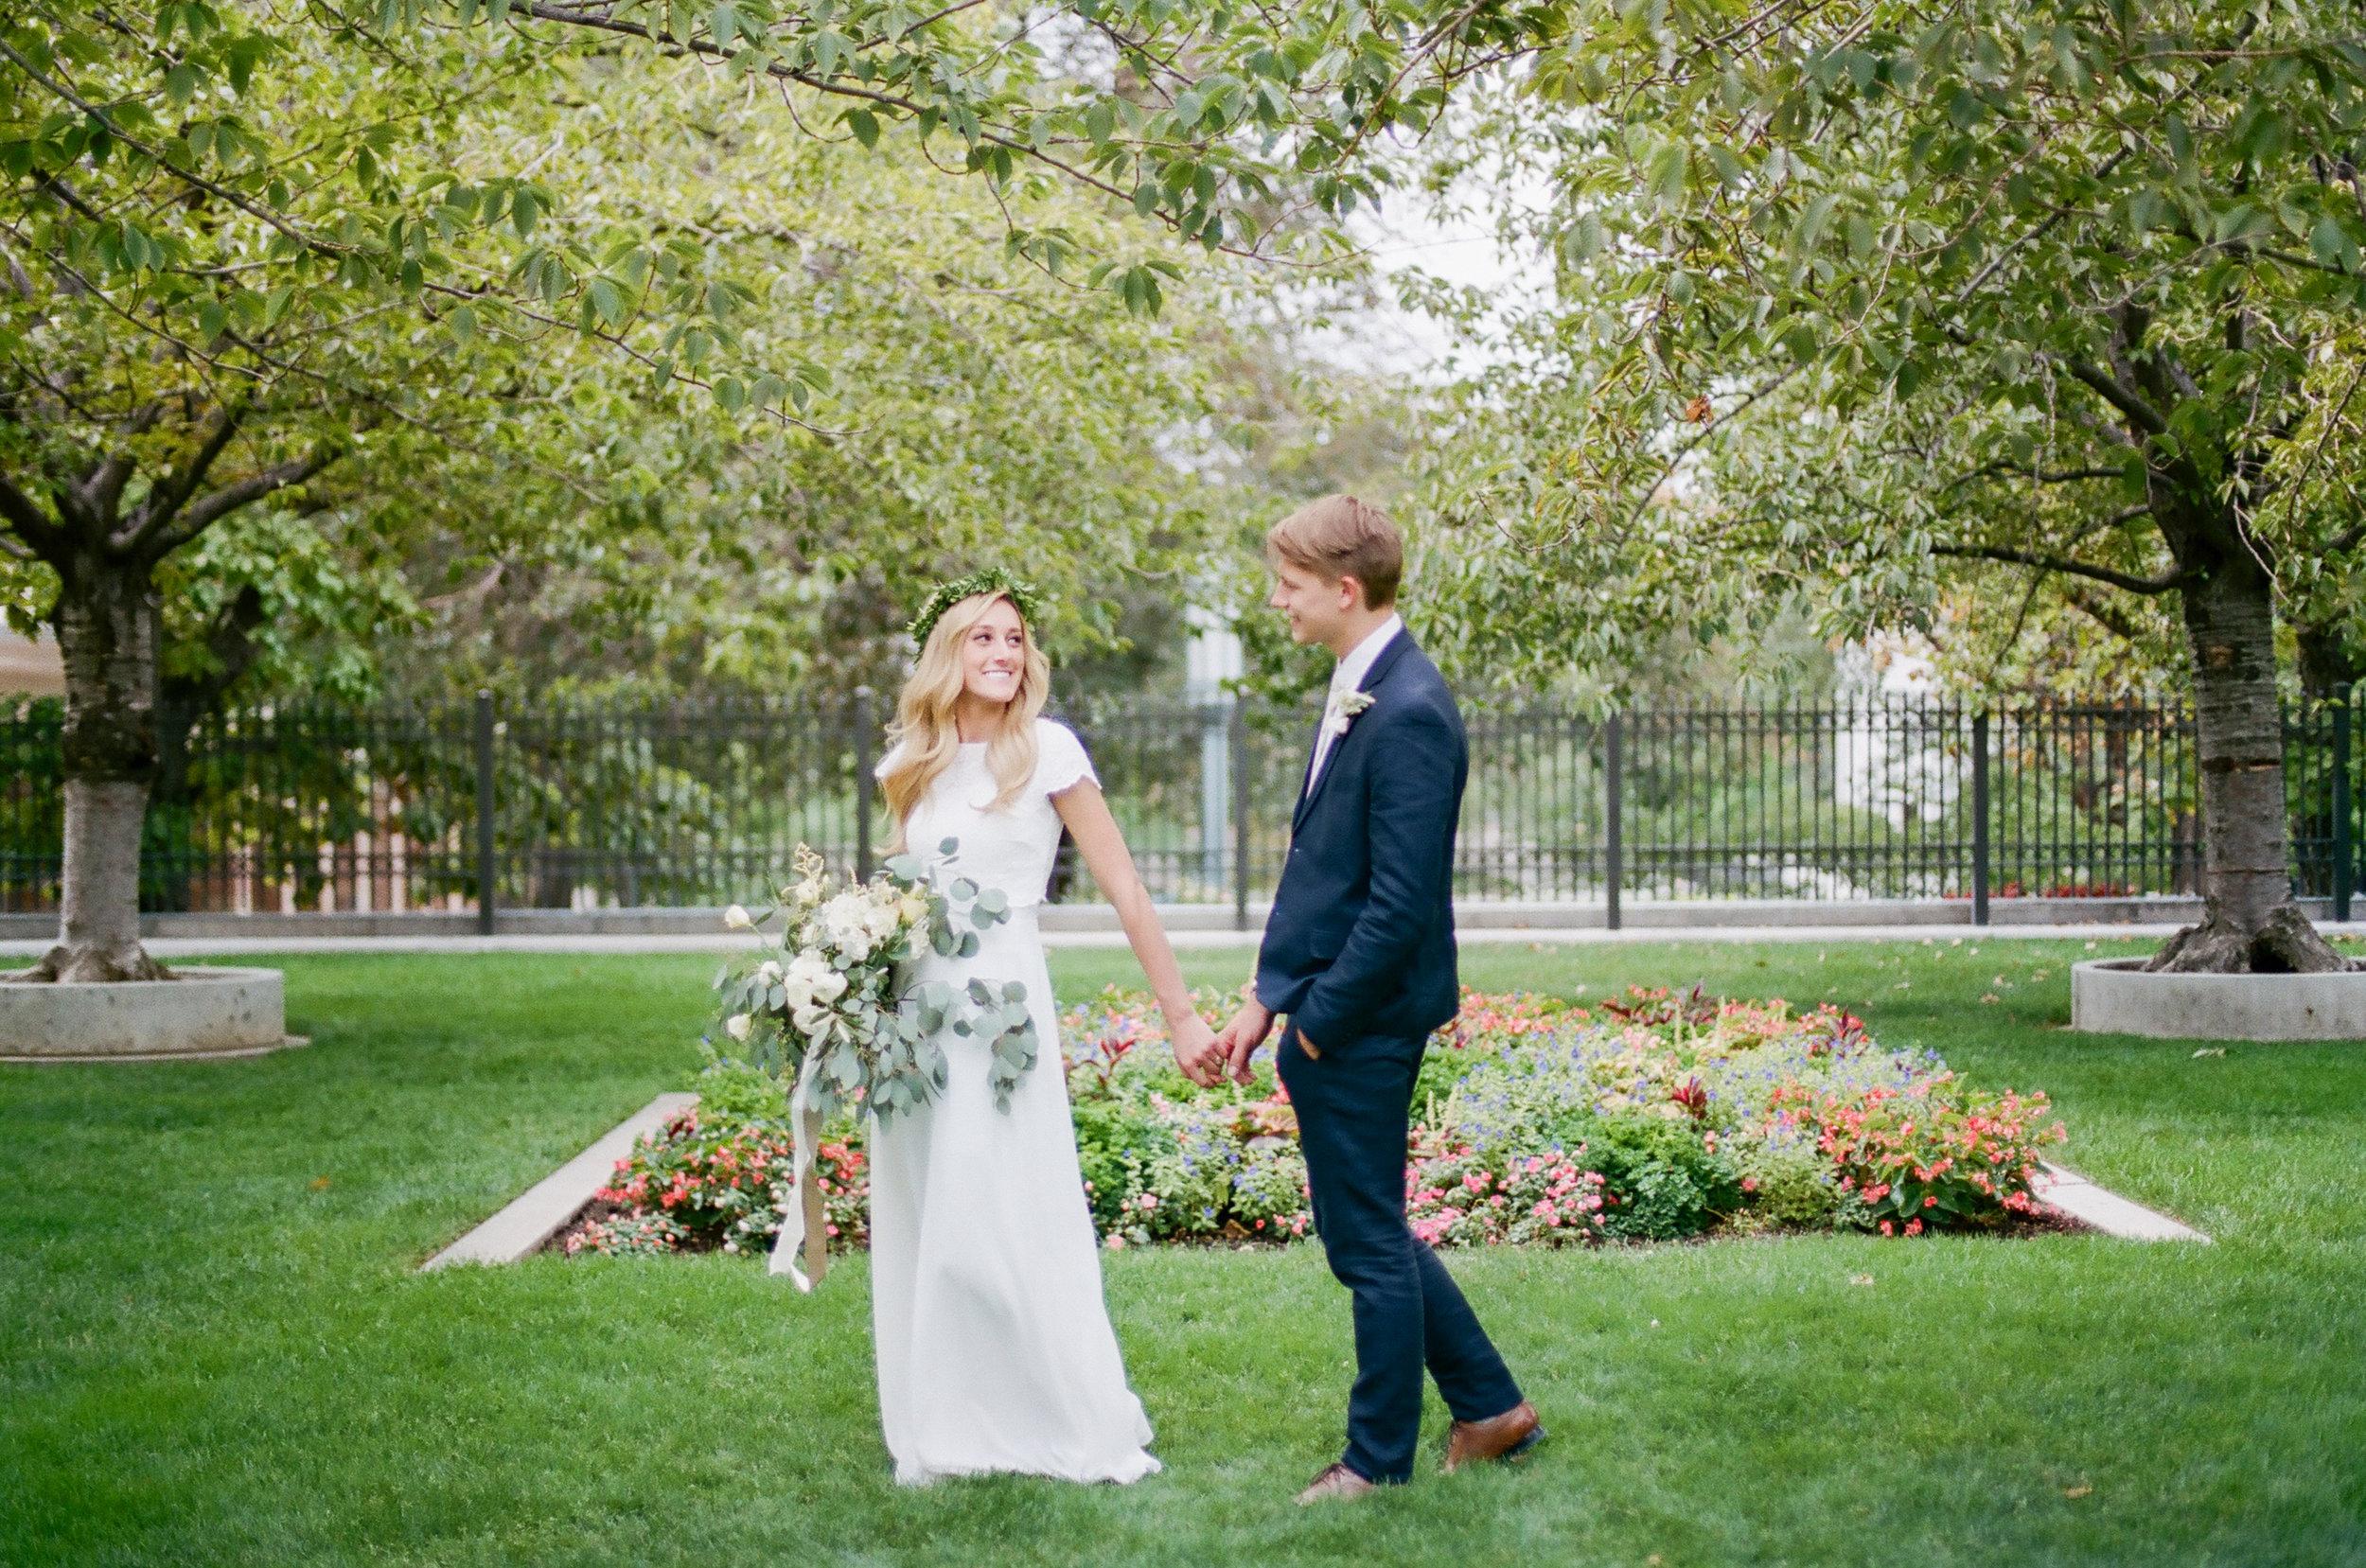 Wynona Benson Photography - Jaleisa & Logan Romantic Elegant Utah Wedding00047.jpg